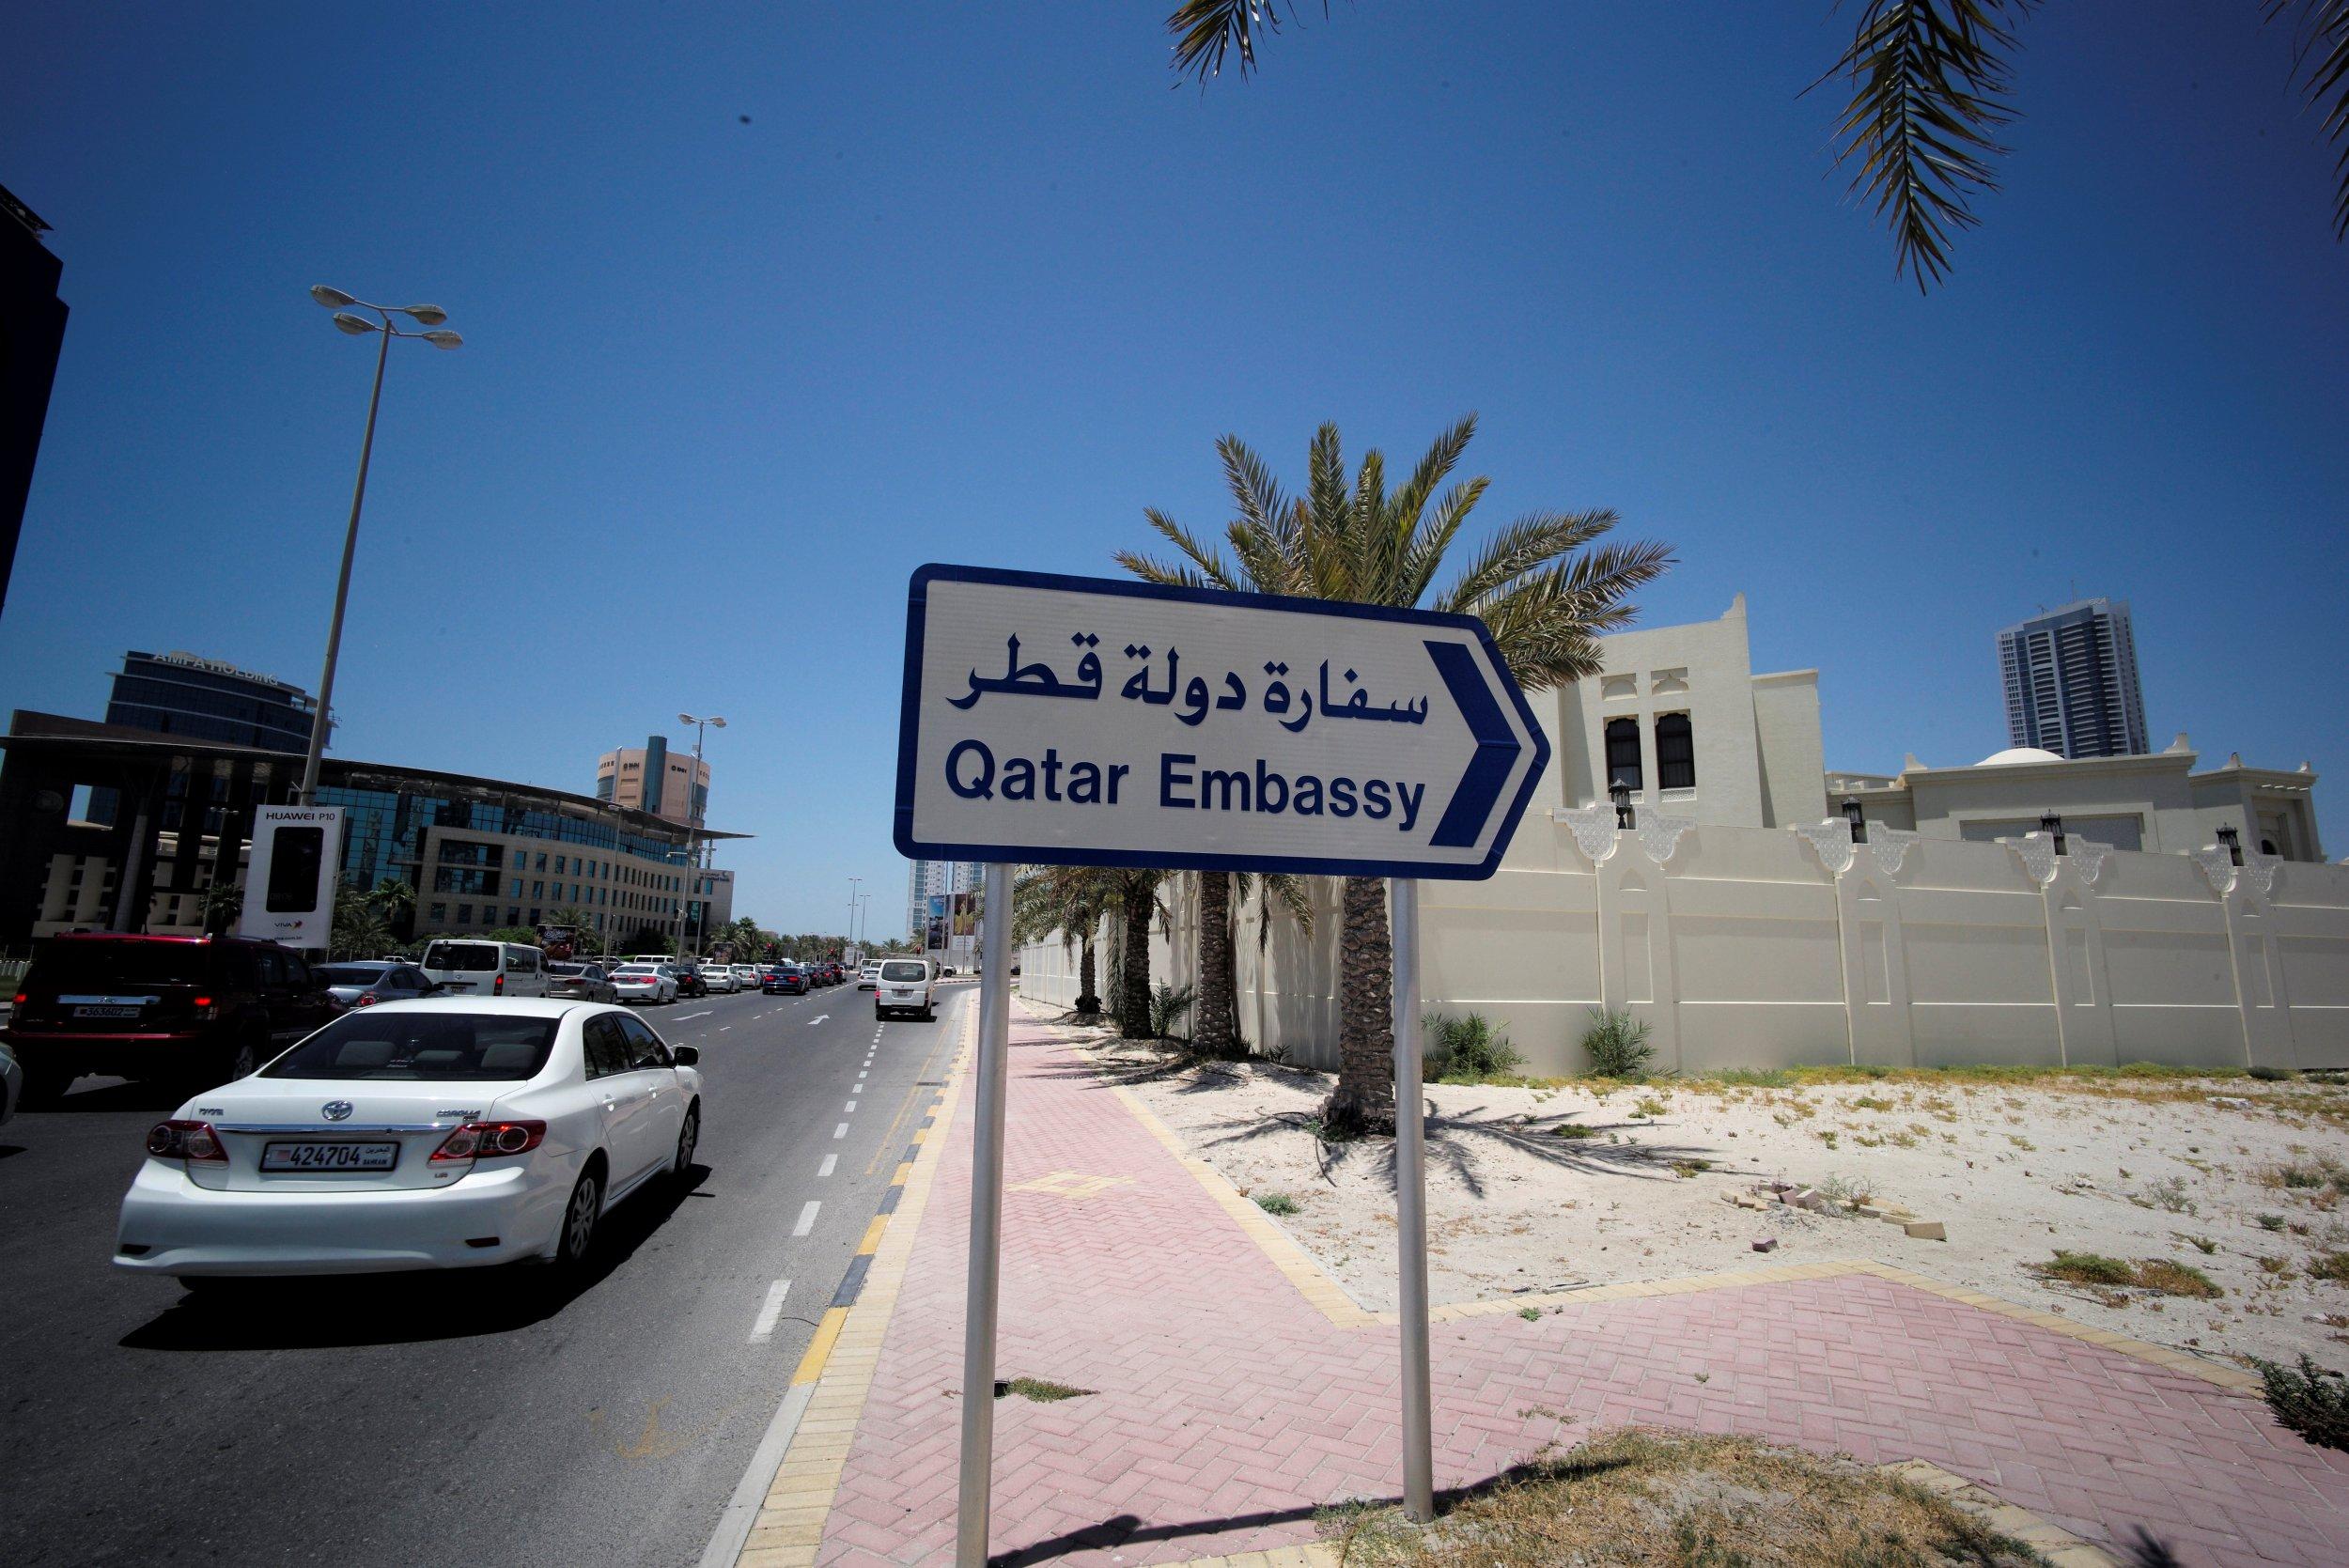 qatar and saudi arabia relationship